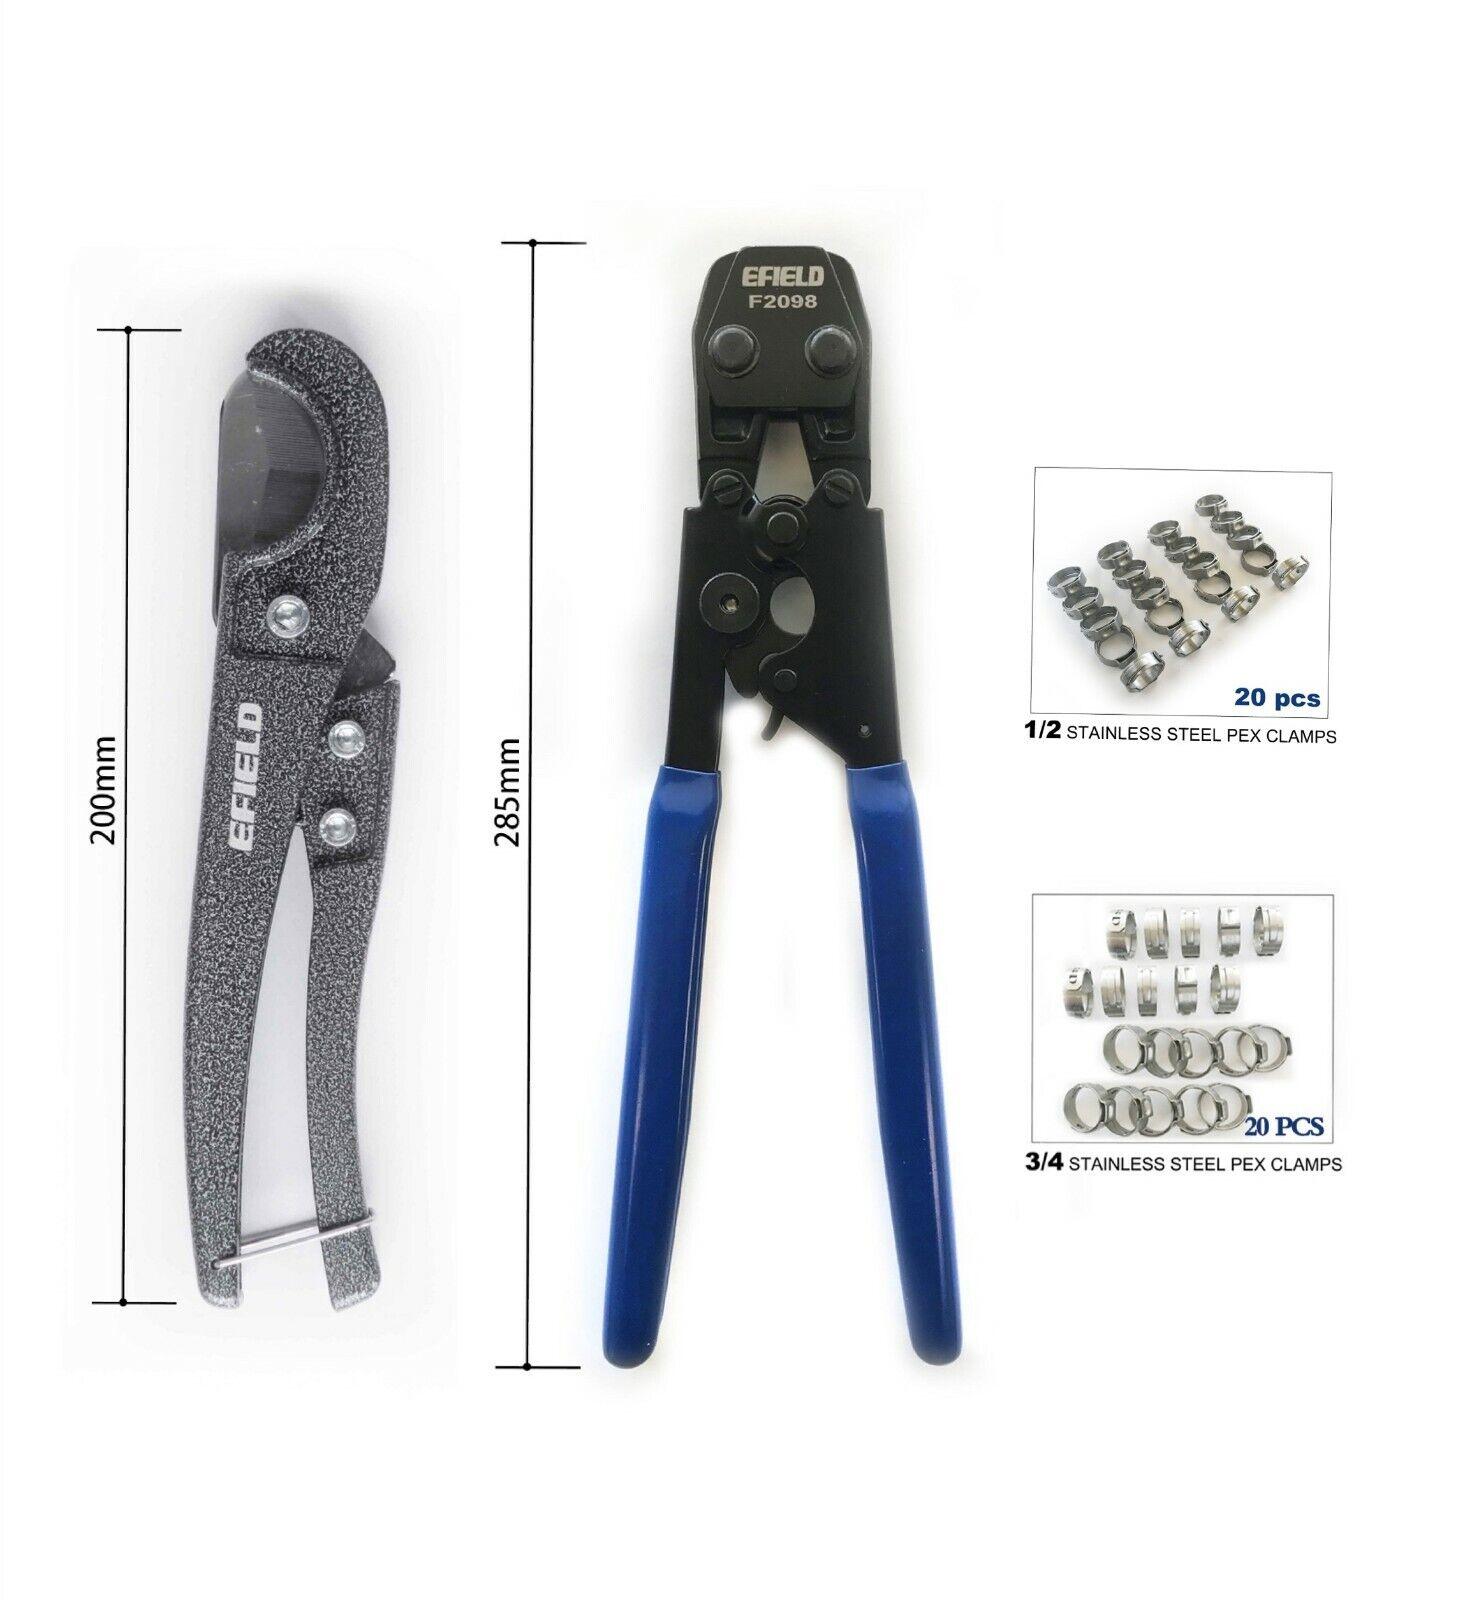 Pex Cinch Crimping Tool Kit, Pipe Cutter +40 Rings Cinch Cla